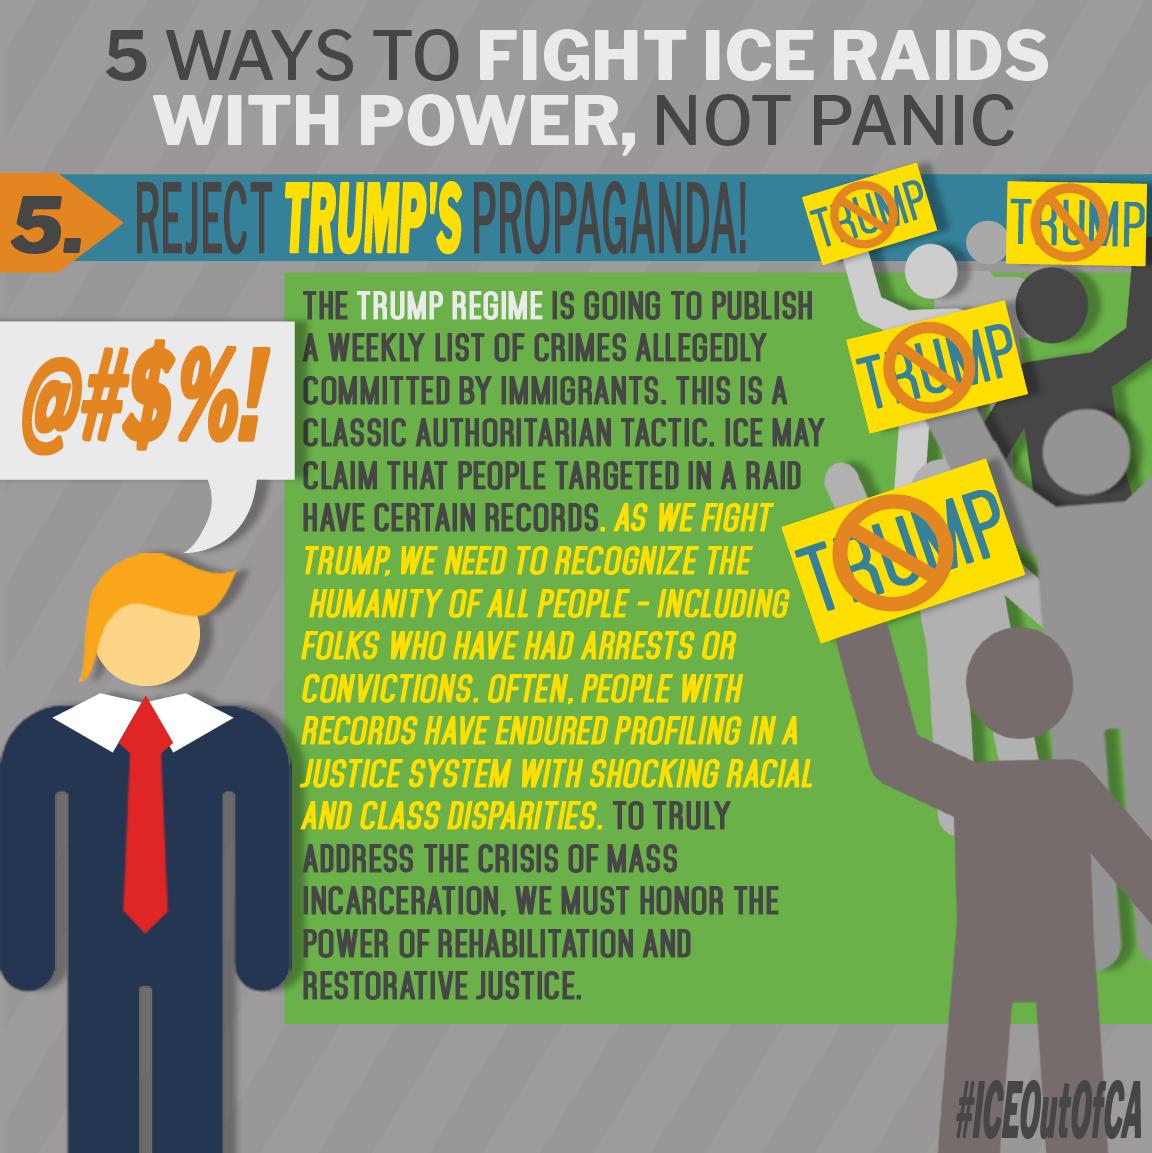 5. Reject Trump's Propaganda